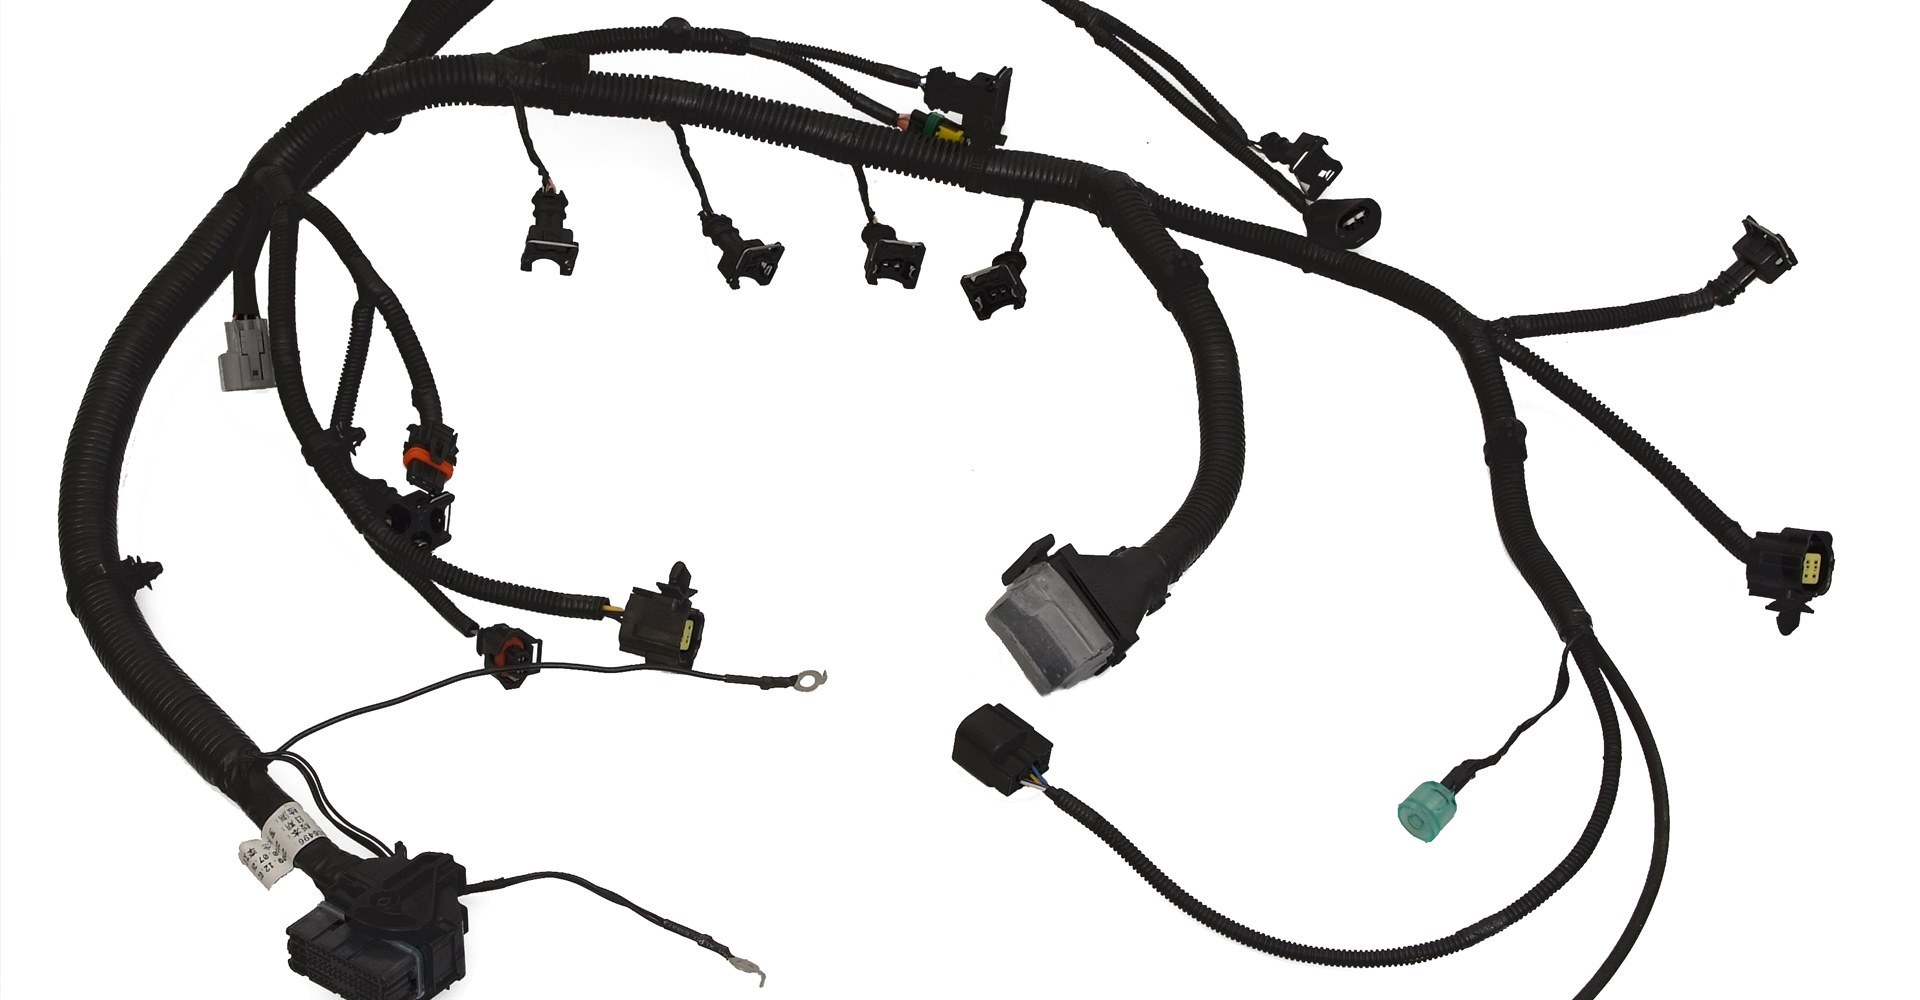 RCD-MC503E 大型医疗设备线束